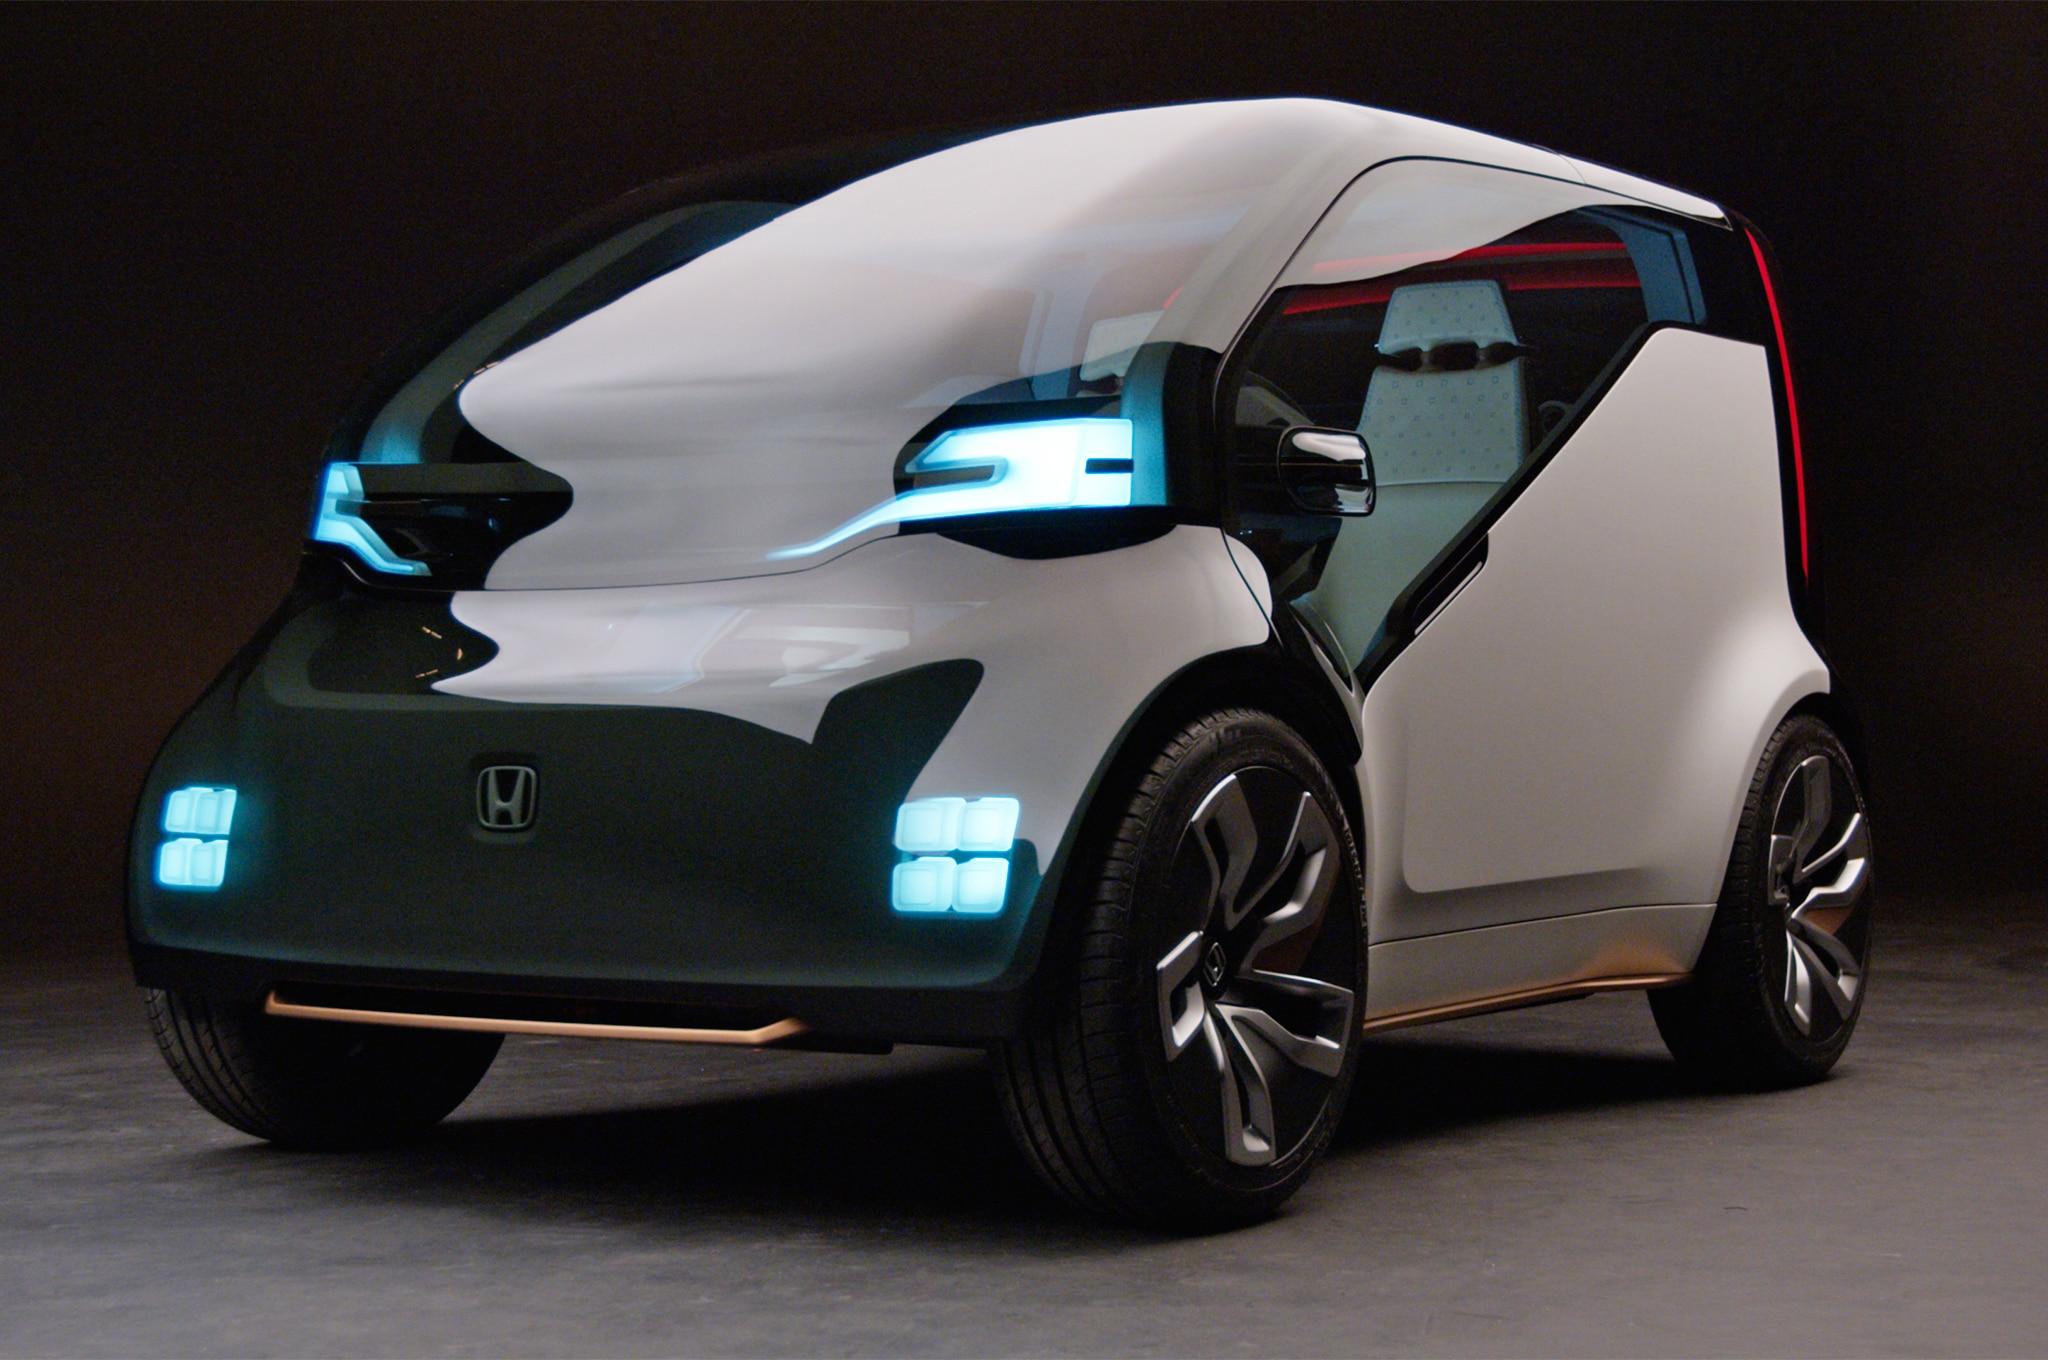 Honda NeuV Cooperative Mobility Ecosystem front three quarter